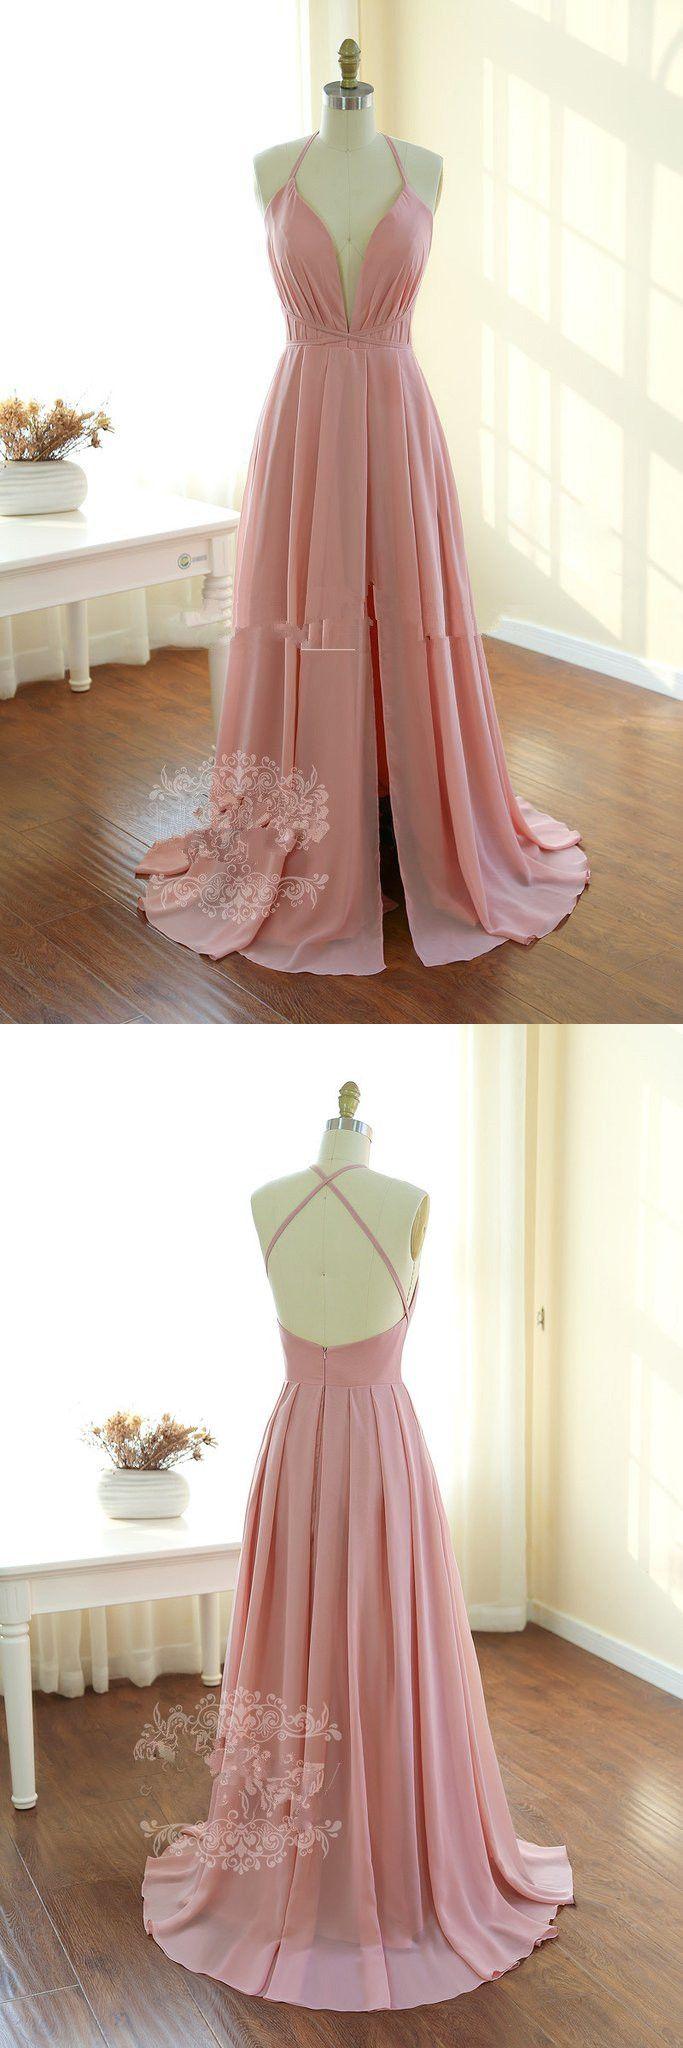 v neck long prom dress, 2017 pink long homecoming dress, backless long homecoming dress, long prom dress, 2017 homecoming dress